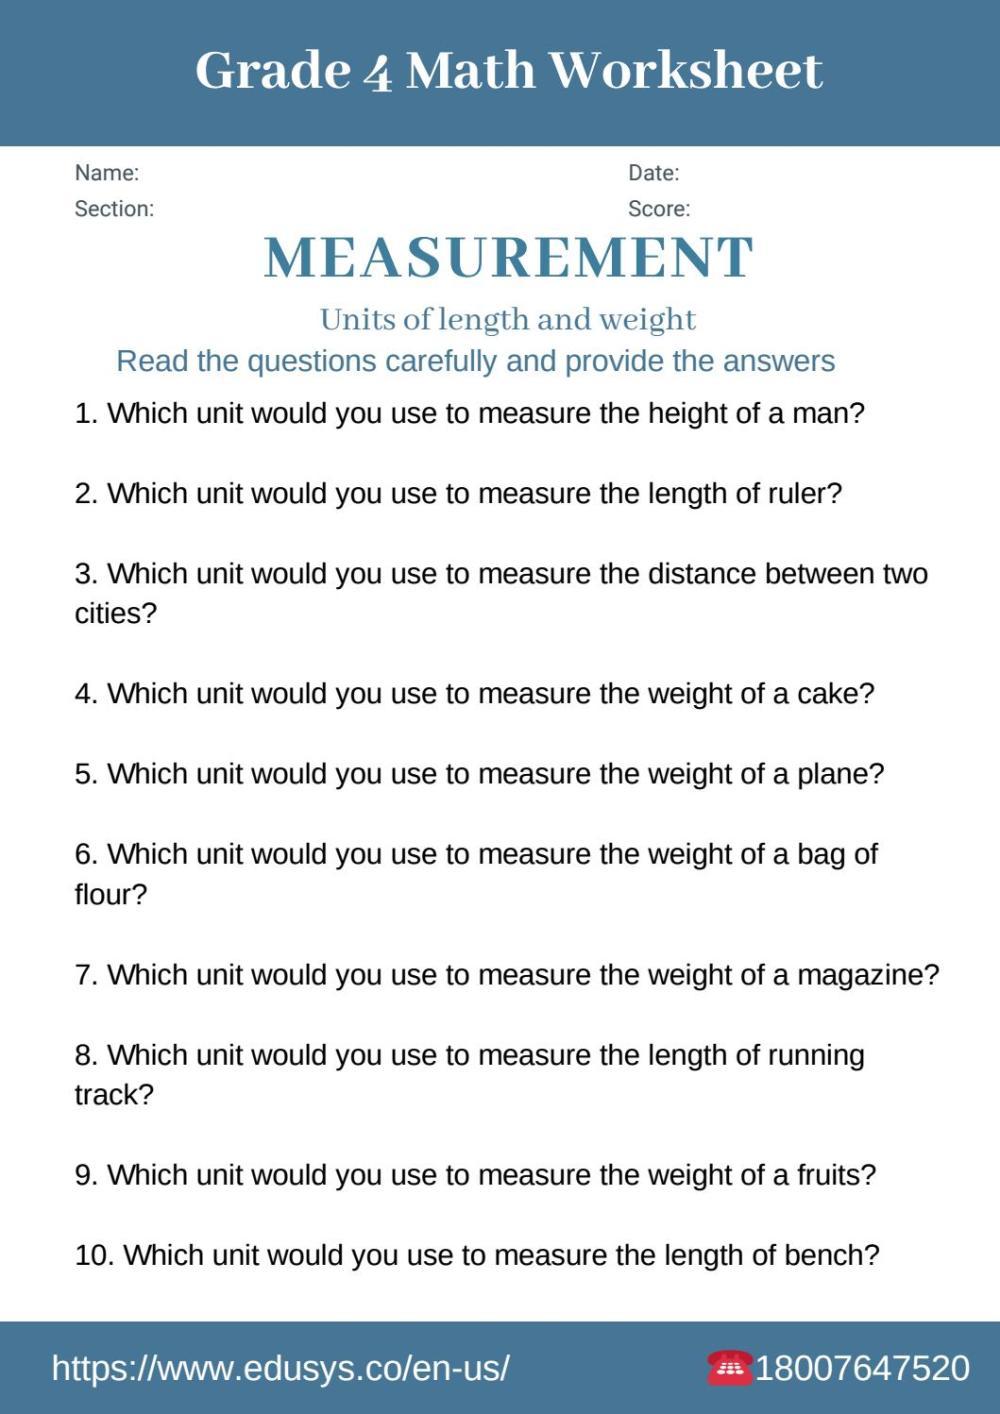 medium resolution of 4th grade math worksheet on measurements by nithya - issuu